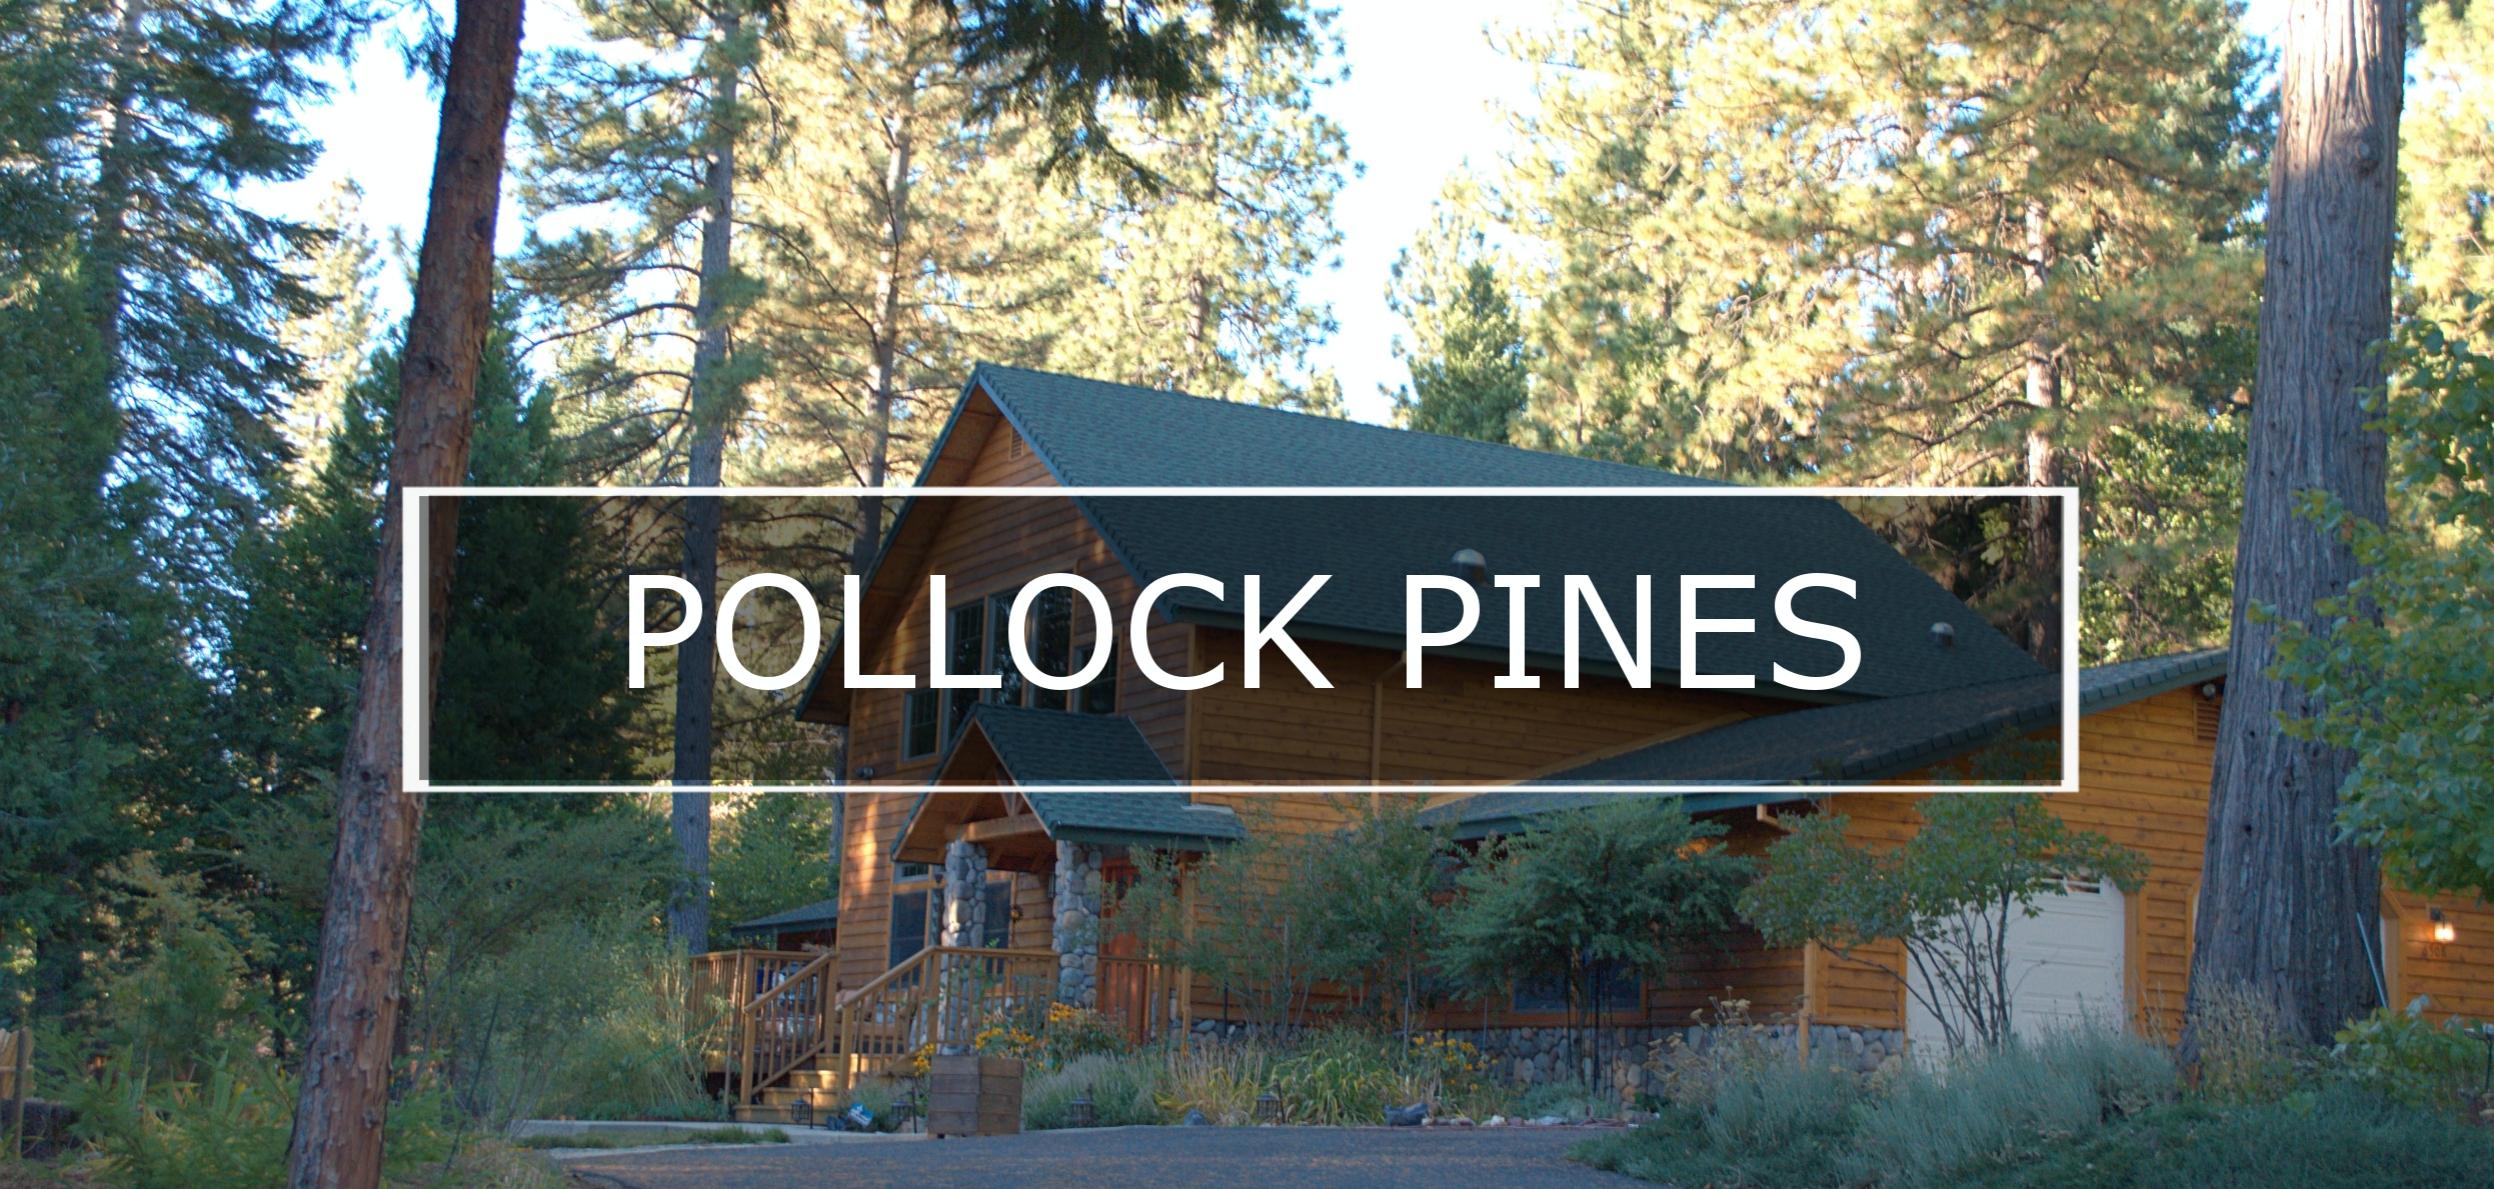 Pollock Pines.png